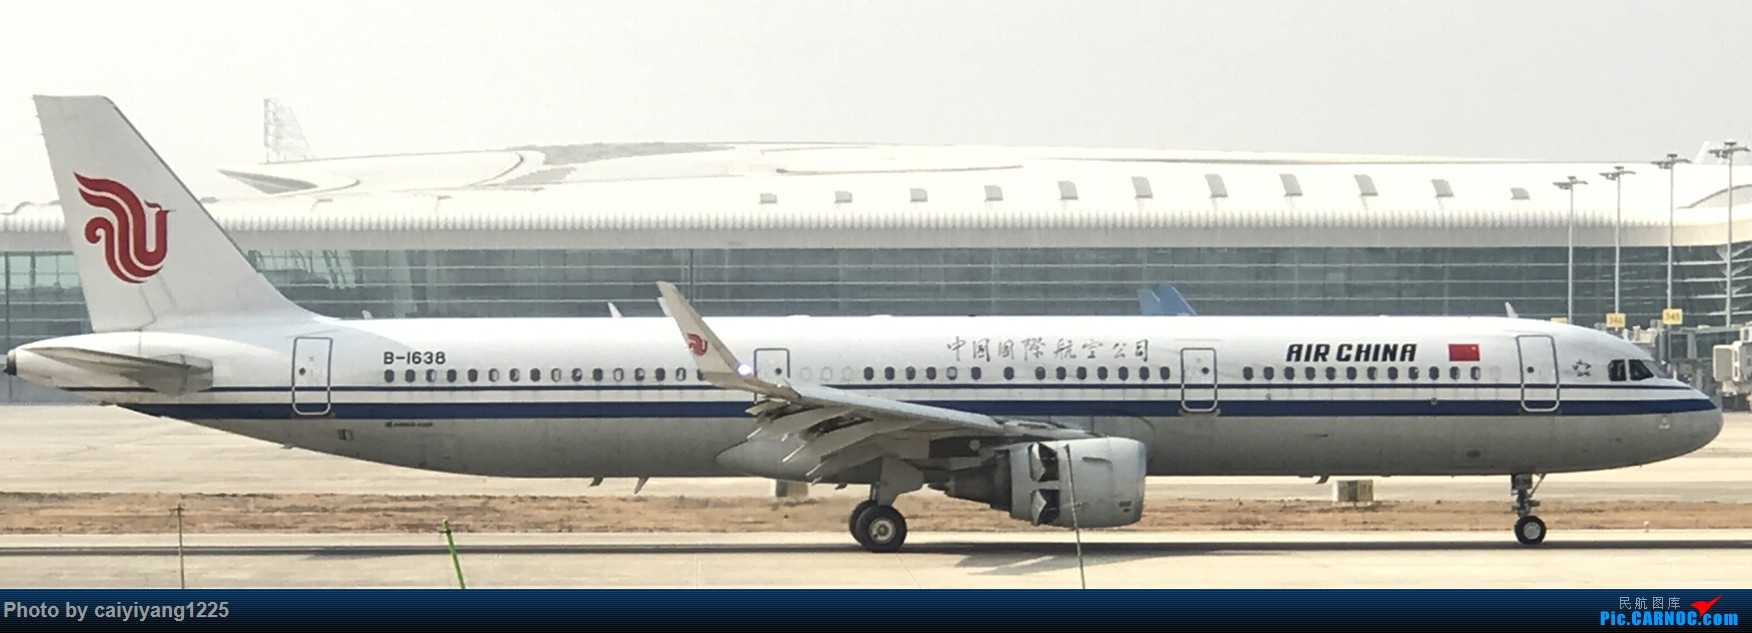 Re:[原创]武汉国庆拍机ps:出门忘带相机 拿手机拍的烂货请见谅! AIRBUS A321-200 B-1638 武汉天河国际机场